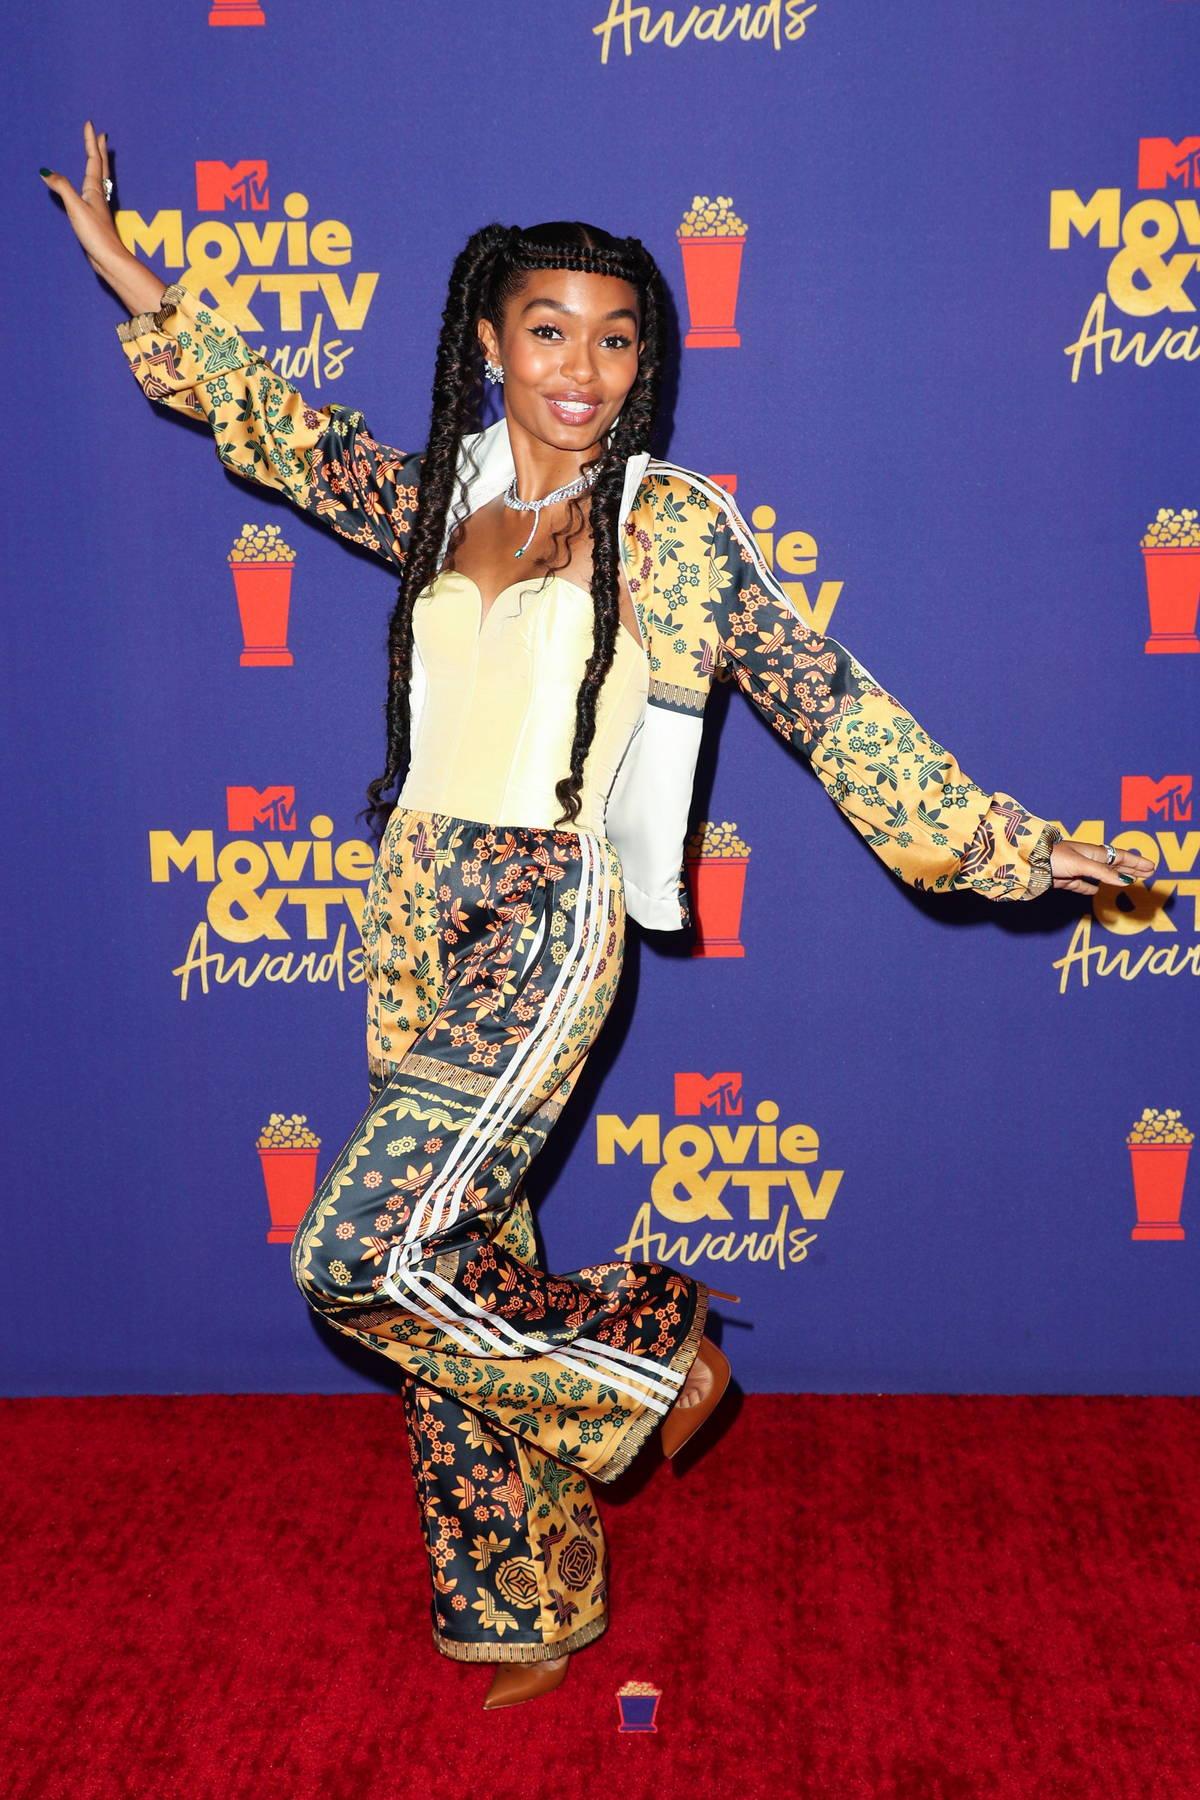 Yara Shahidi attends the 2021 MTV Movie & TV Awards at the Hollywood Palladium in Los Angeles